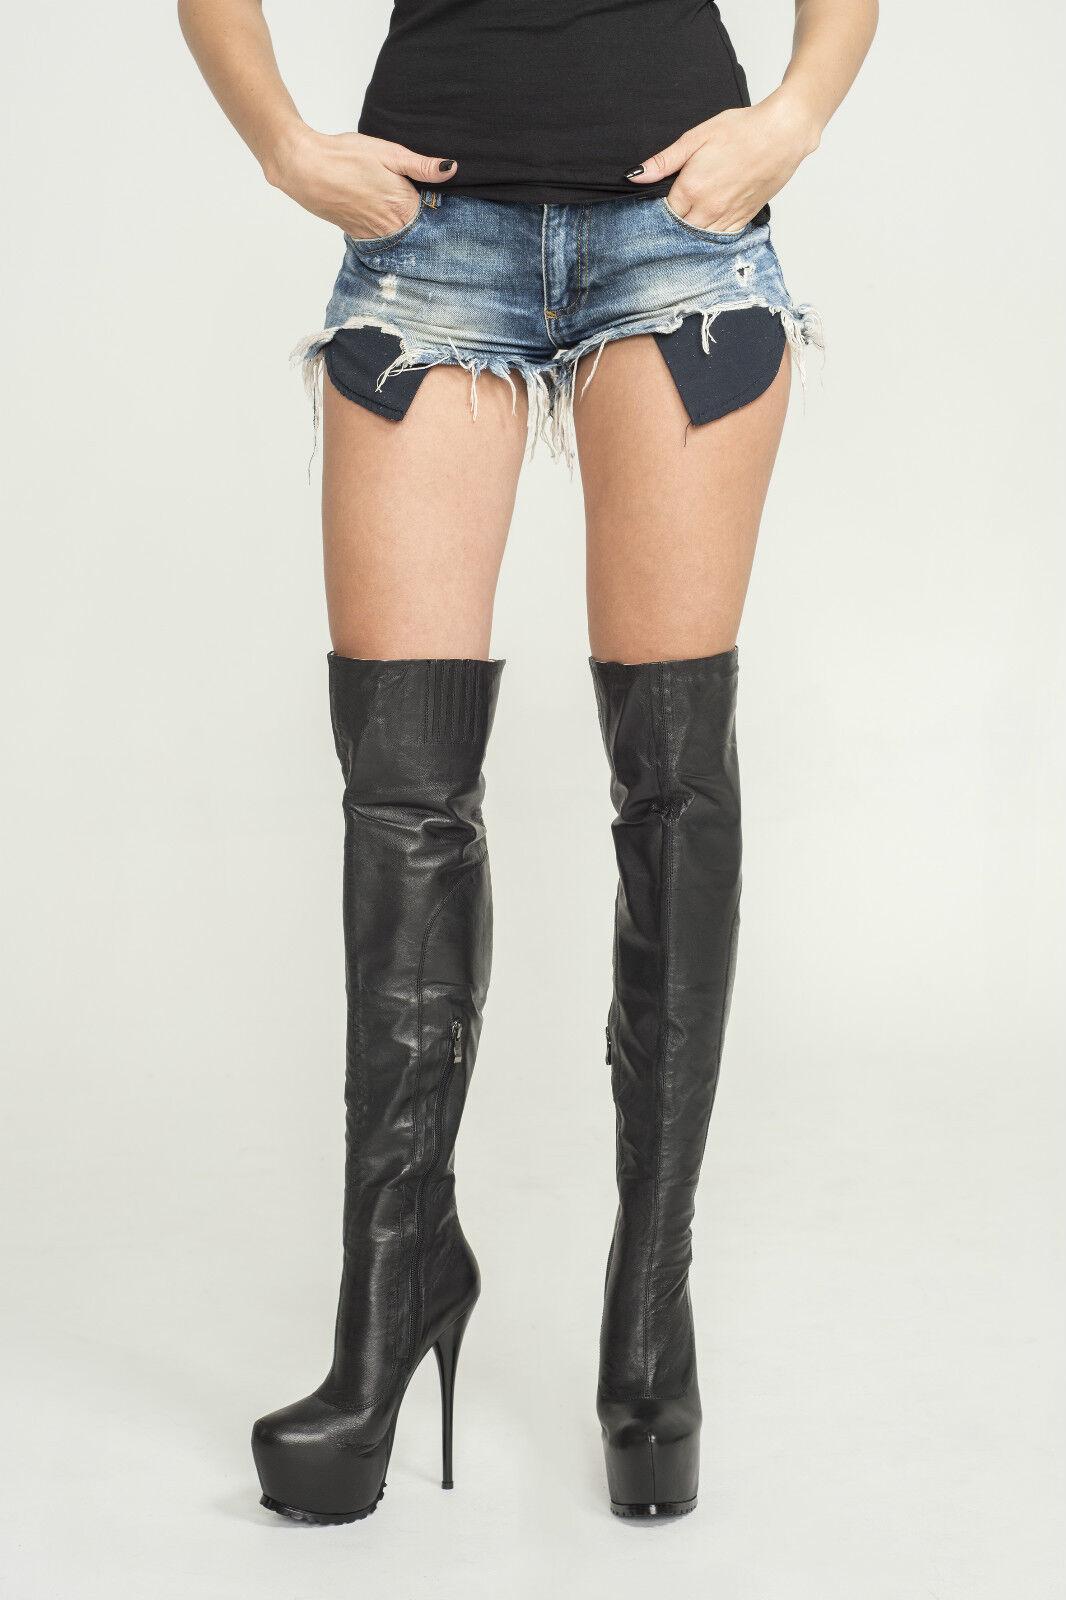 AROLLO Overknee Stiefel ANNA3 Special Edition Größen 37,38,39,40,41,42